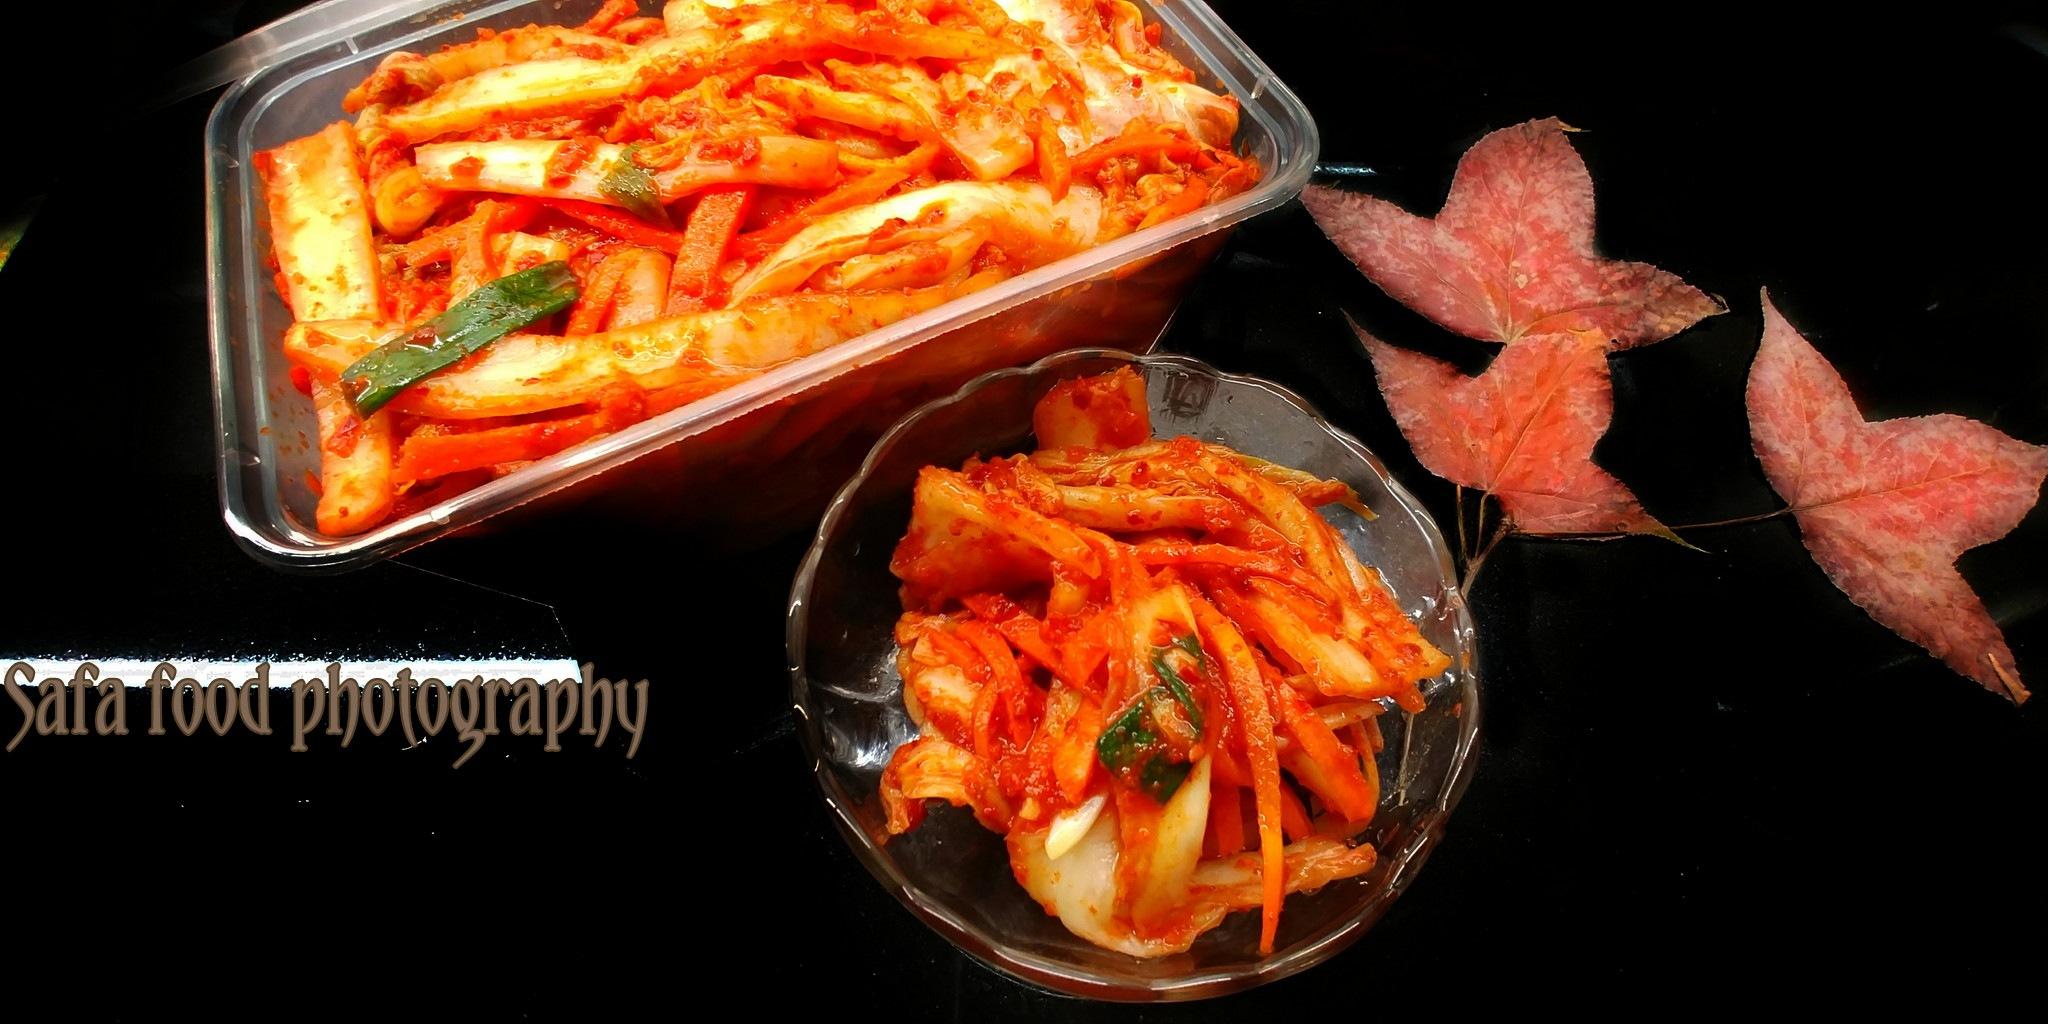 Korean food by Safa salju